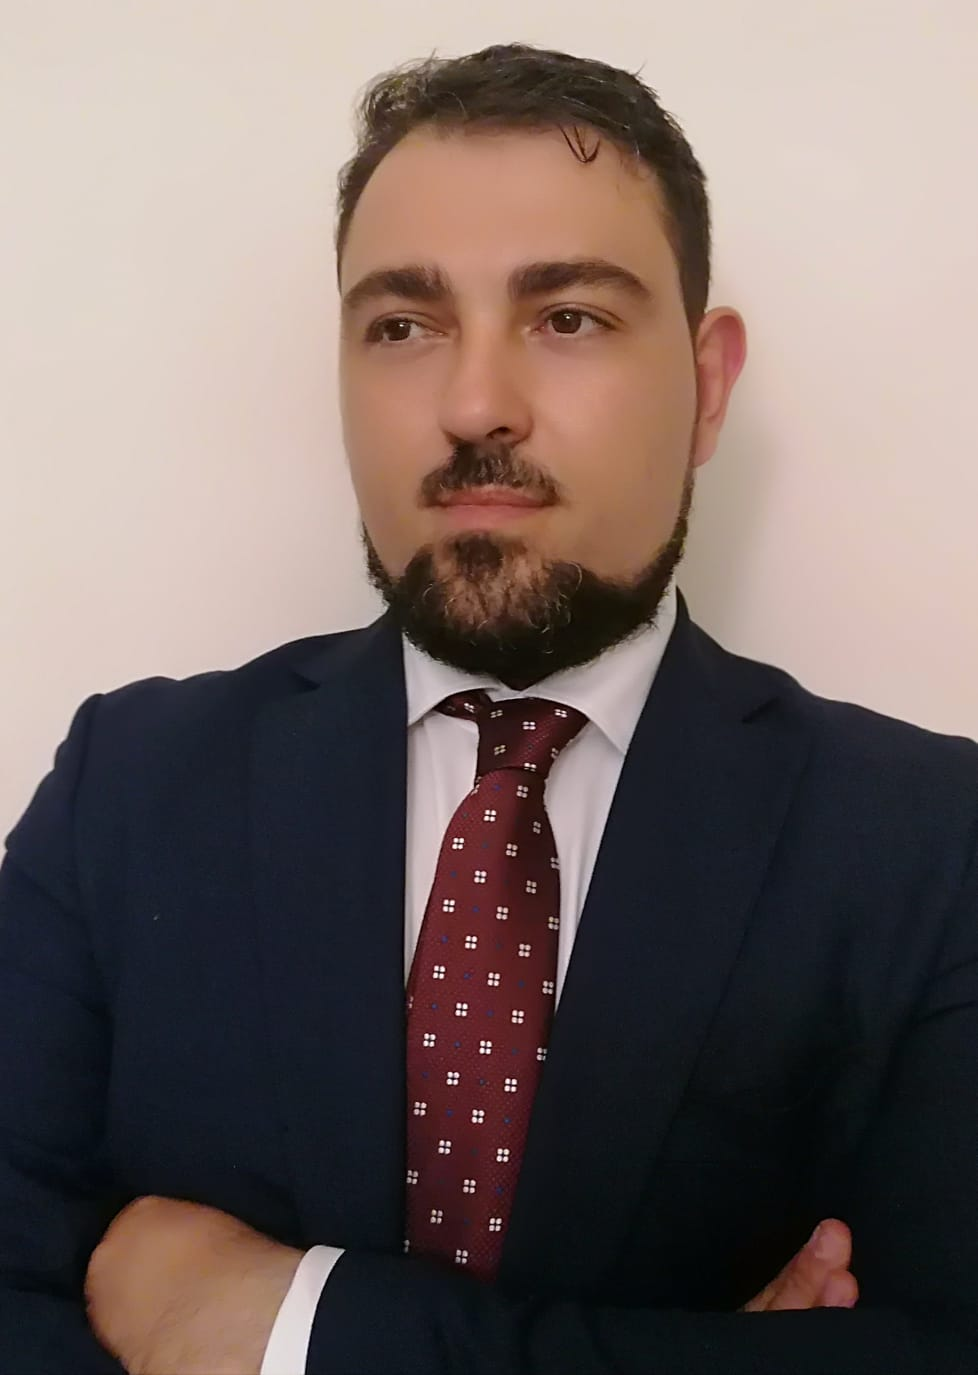 Salvatore Pettirossi